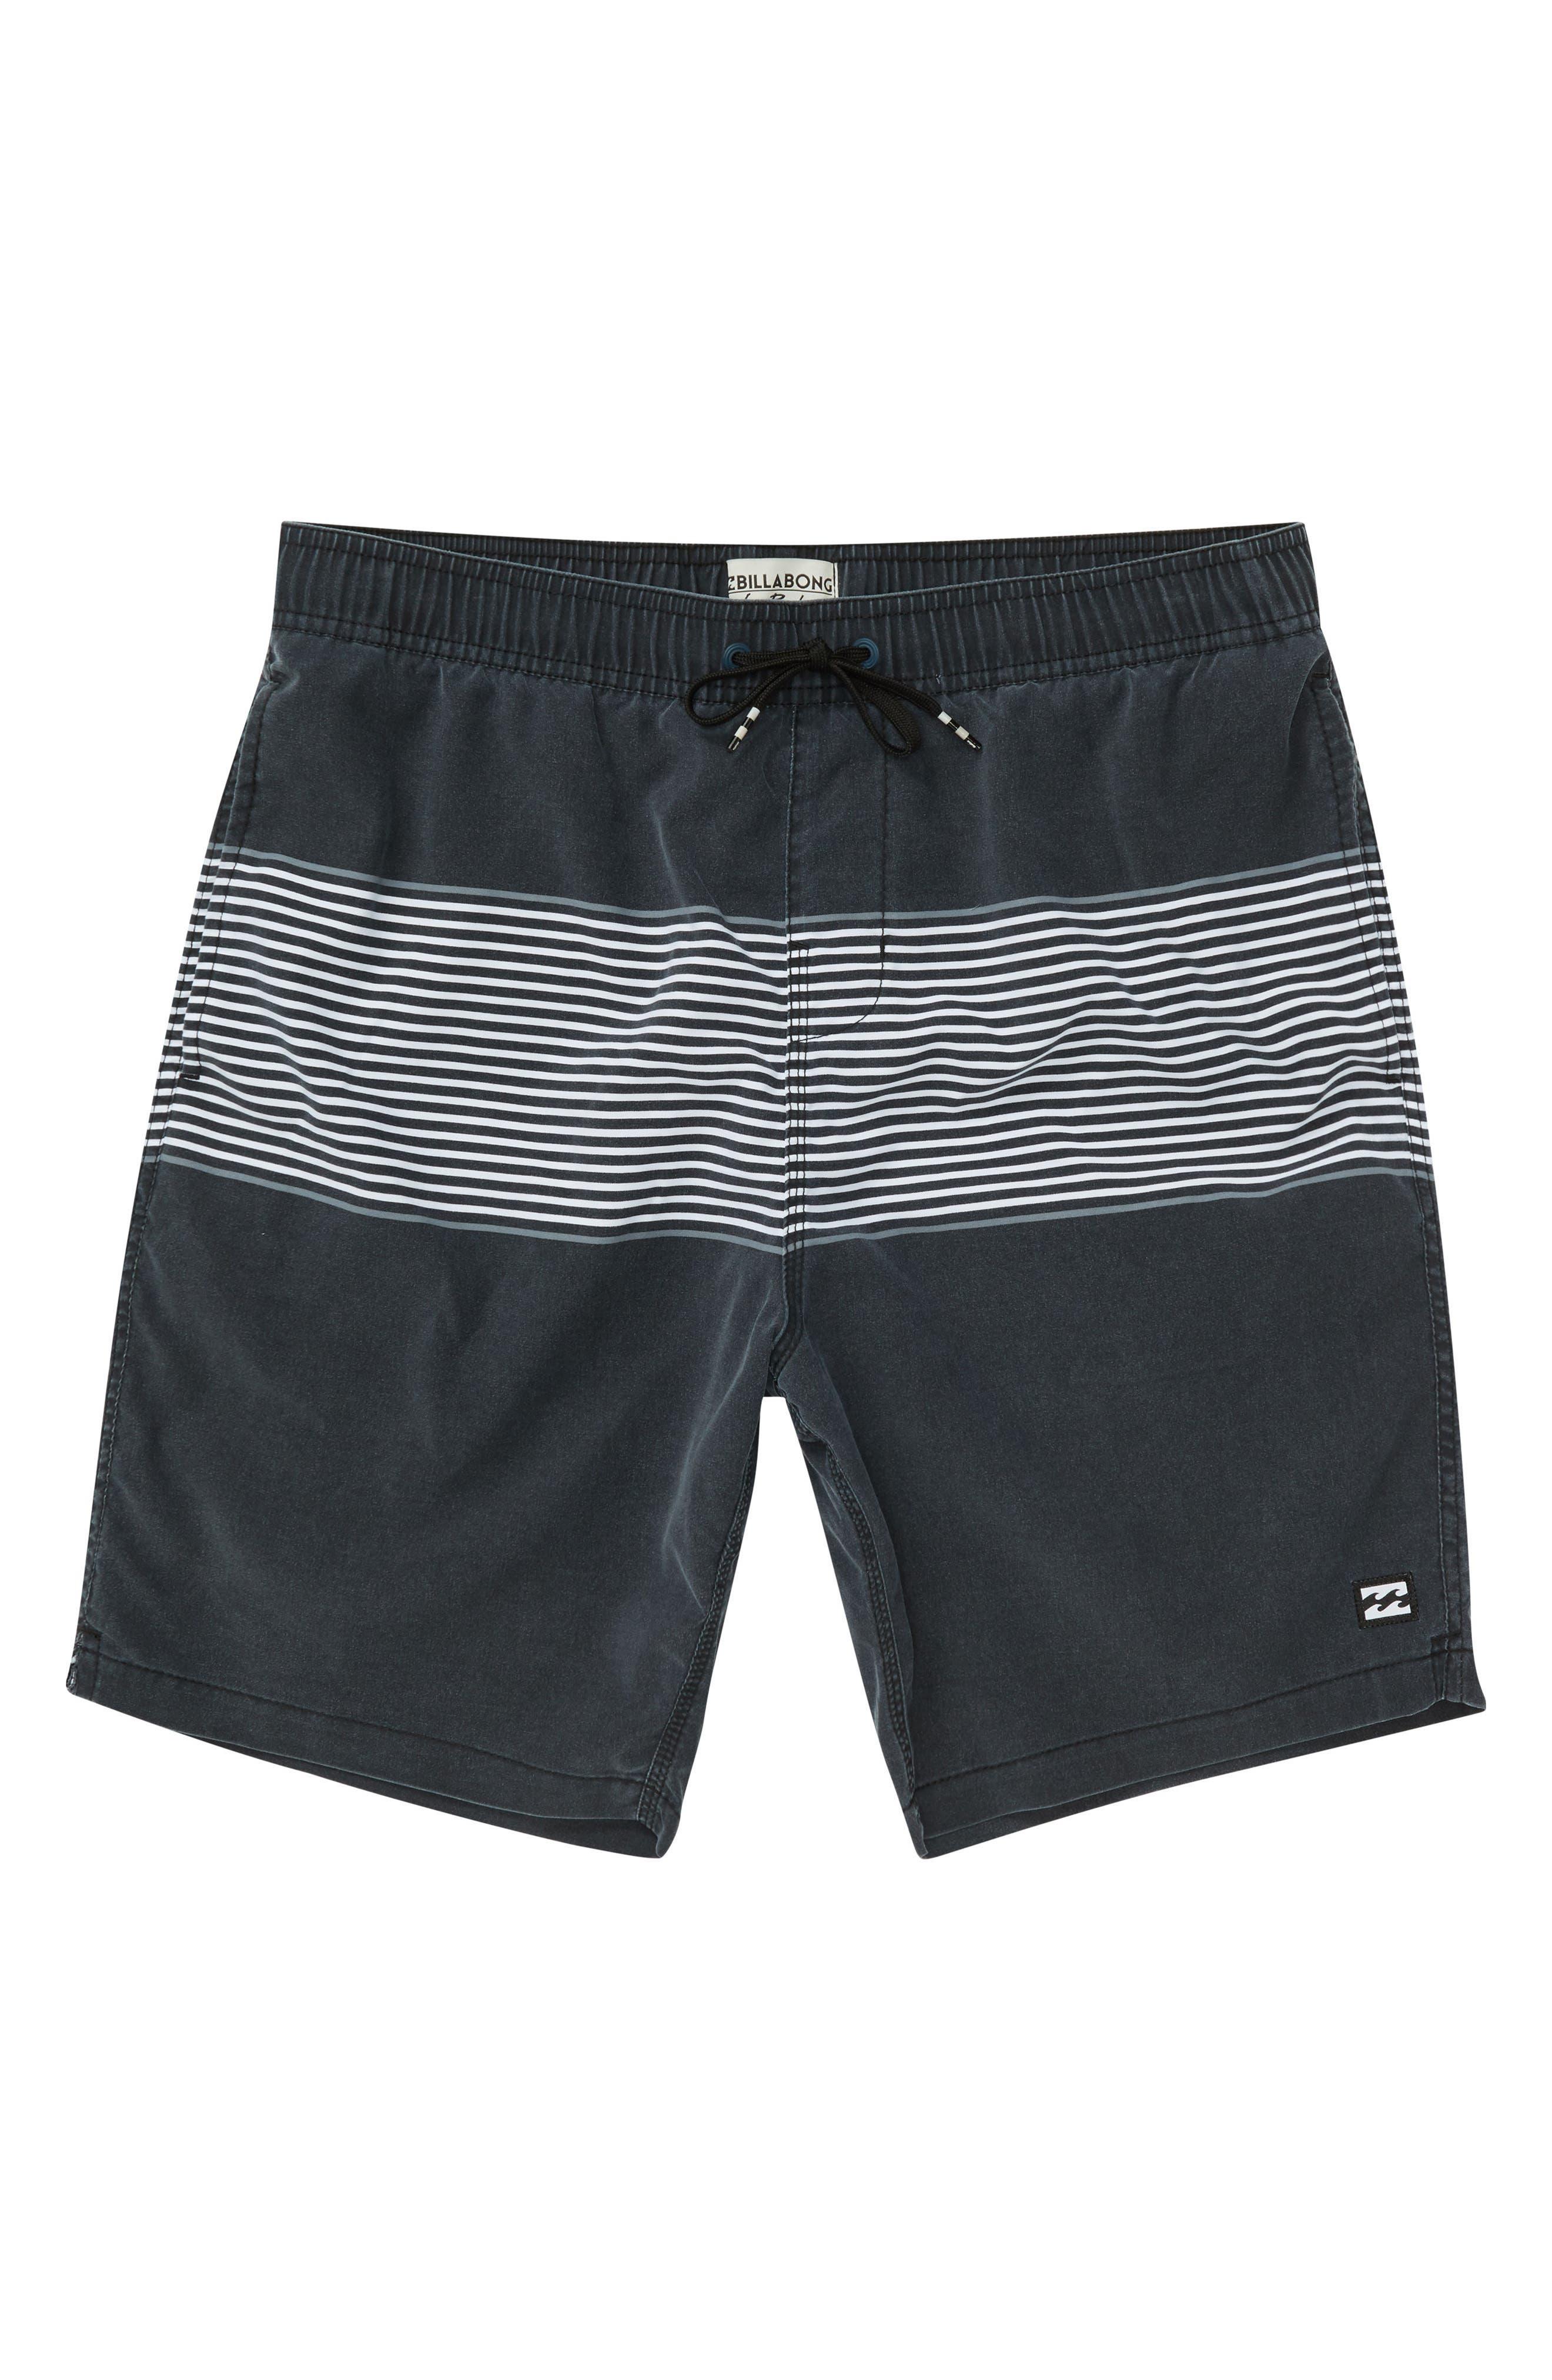 Tribong Swim Trunks,                         Main,                         color, Black